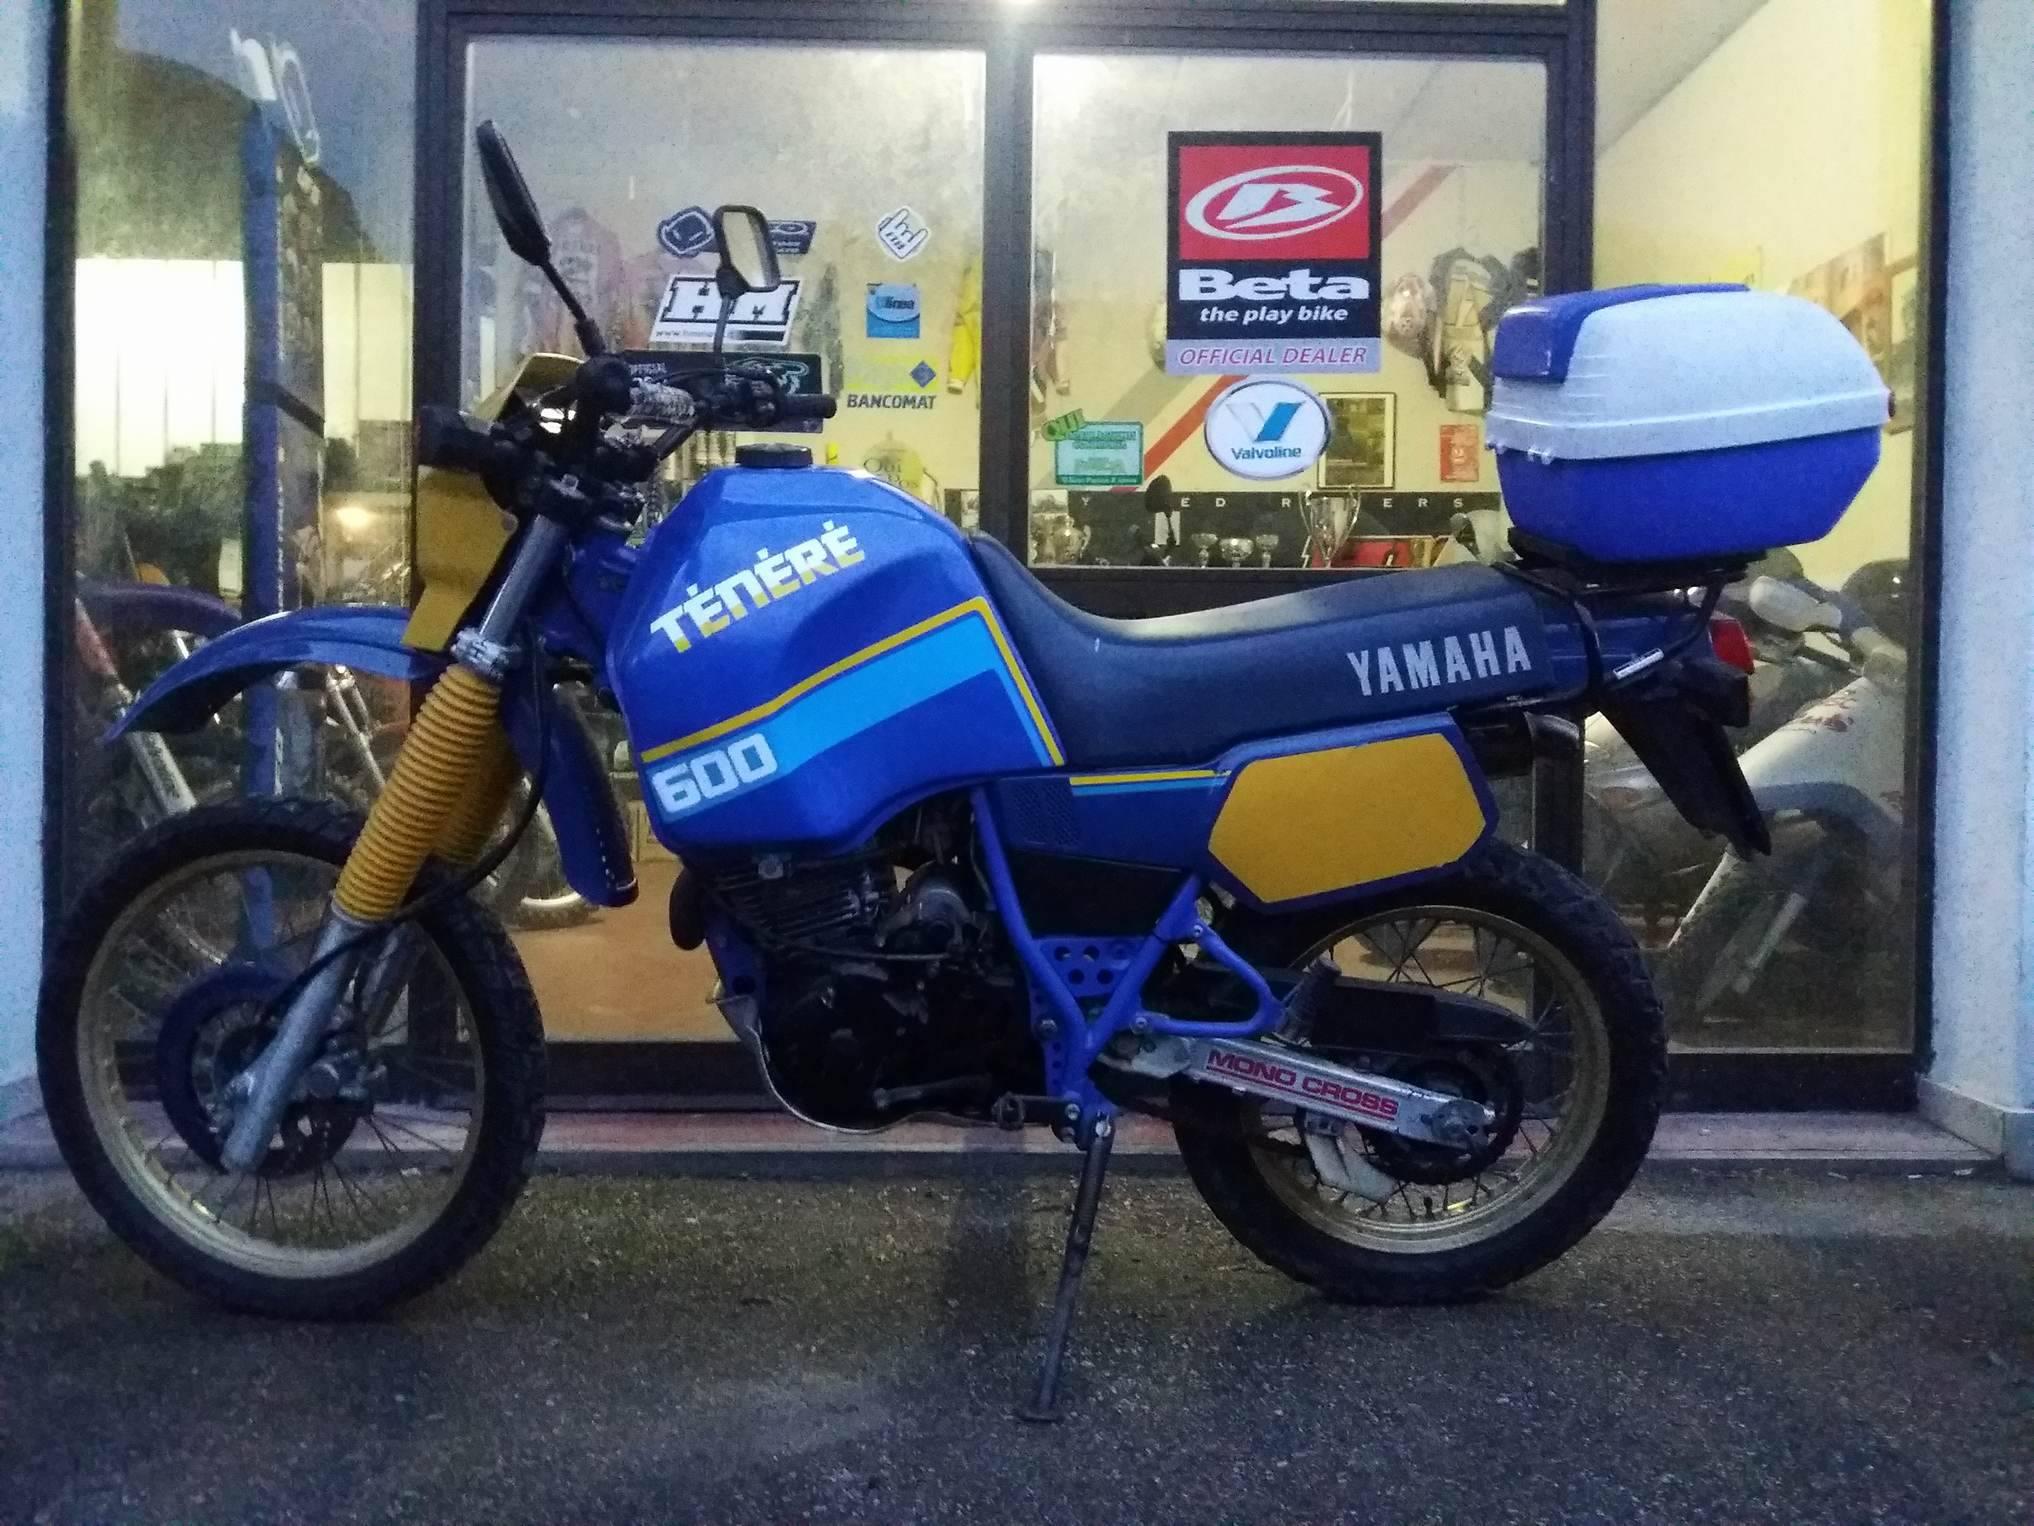 Yamaha tenerè xt 600 z